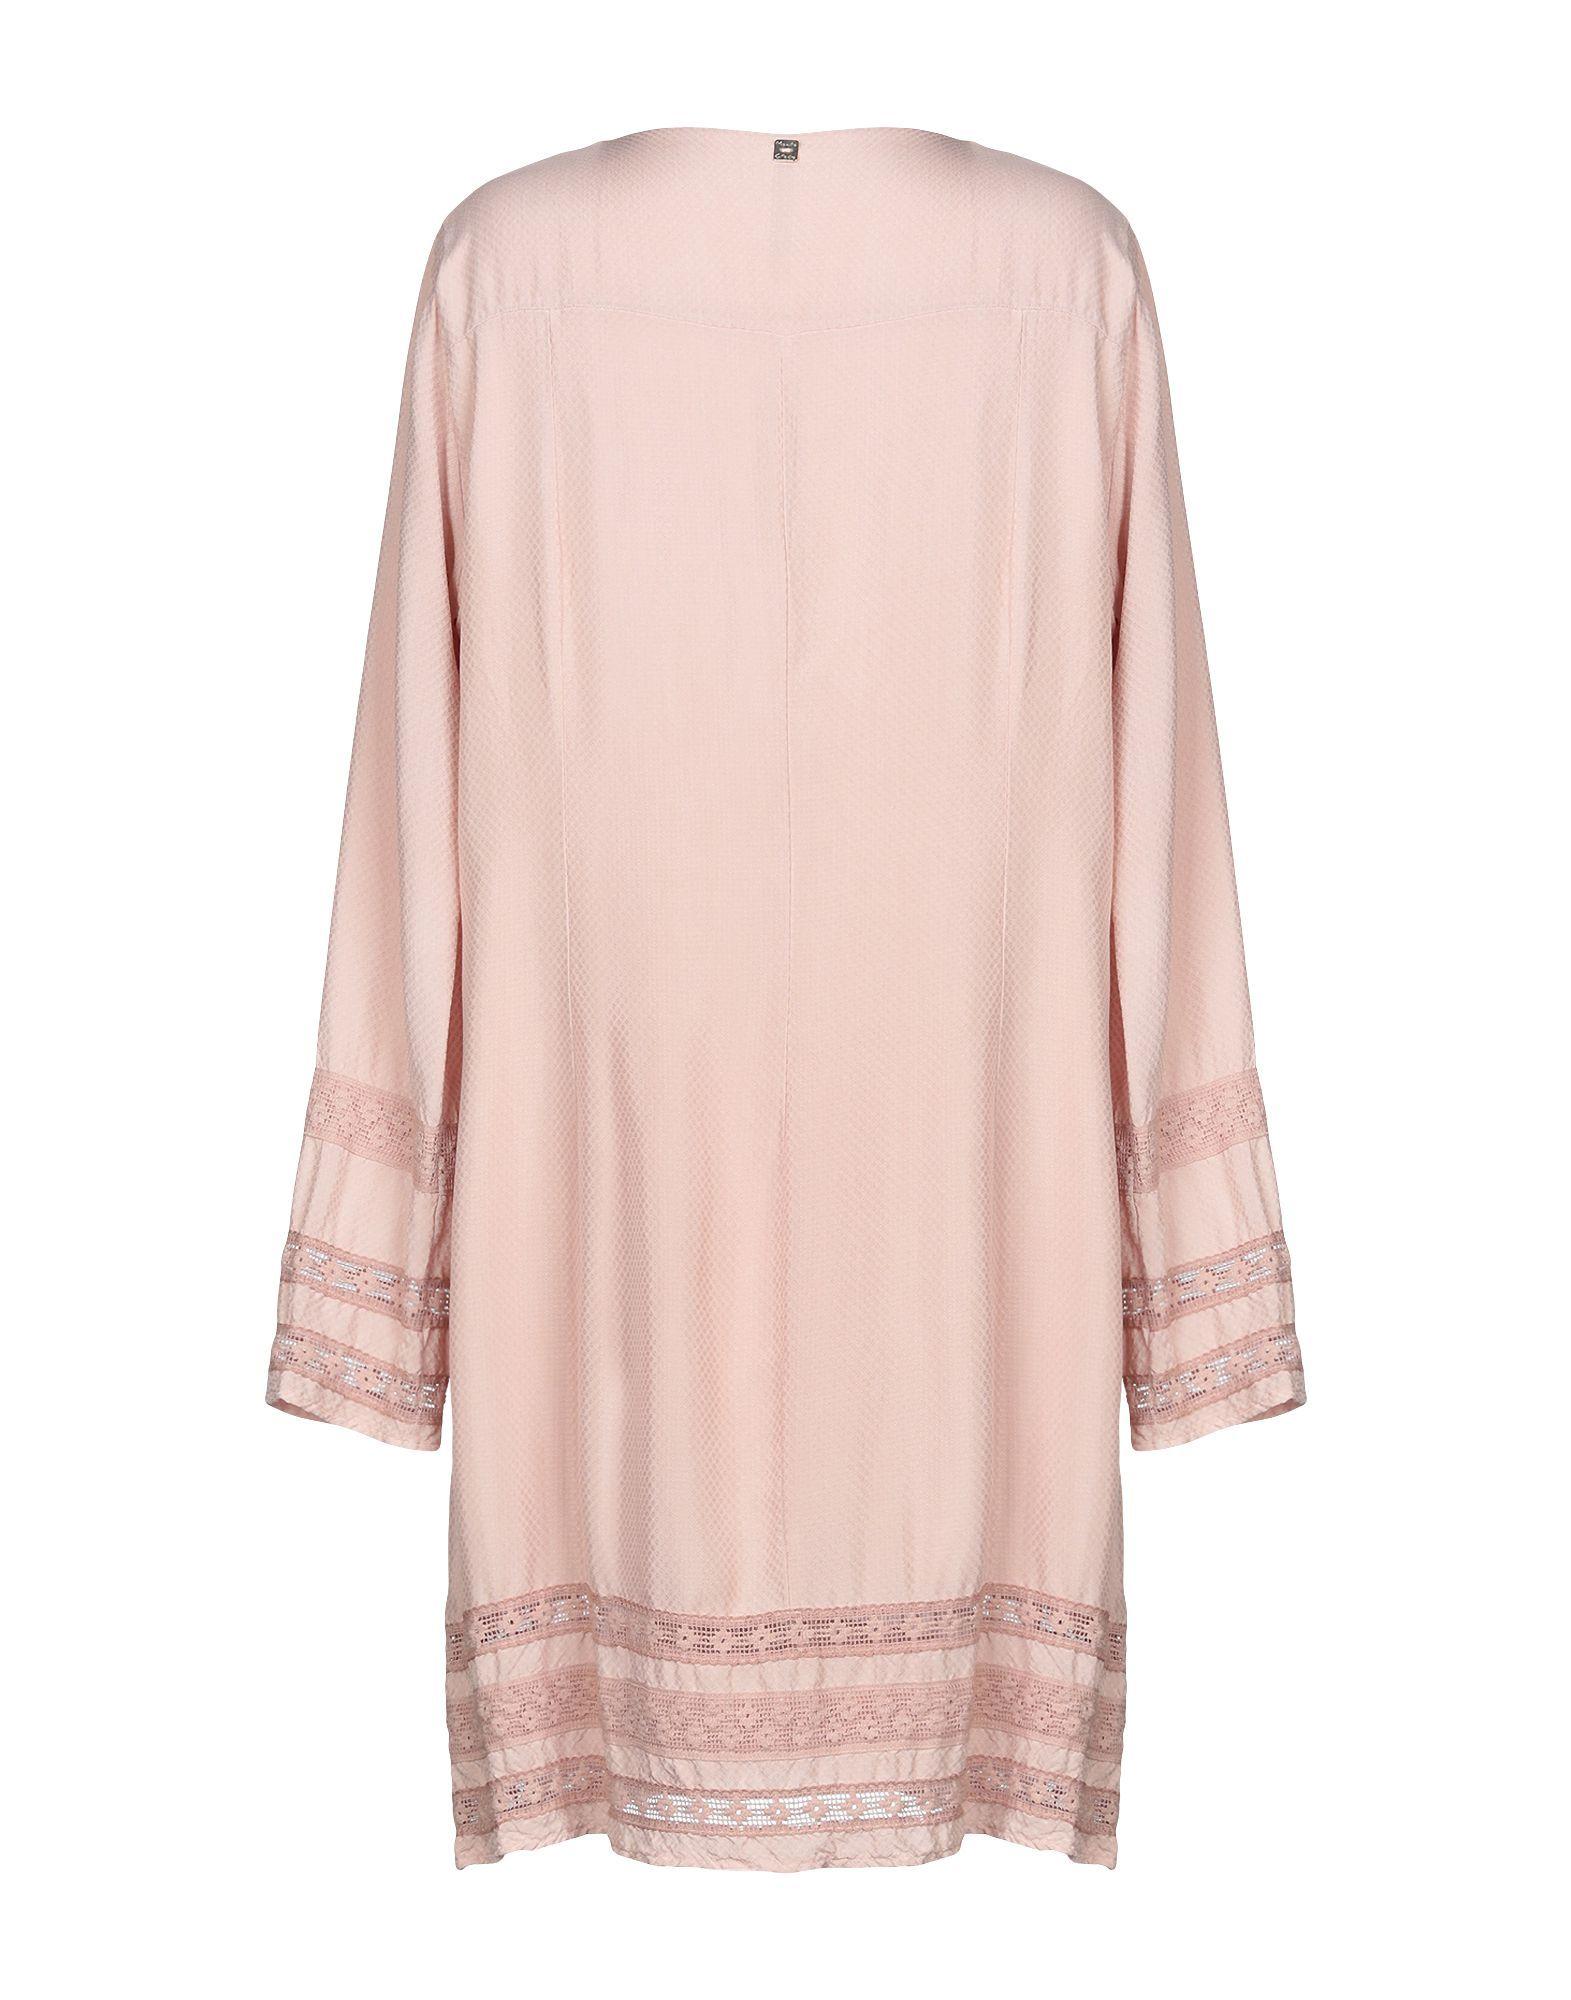 Manila Grace Pale Pink Long Sleeve Dress